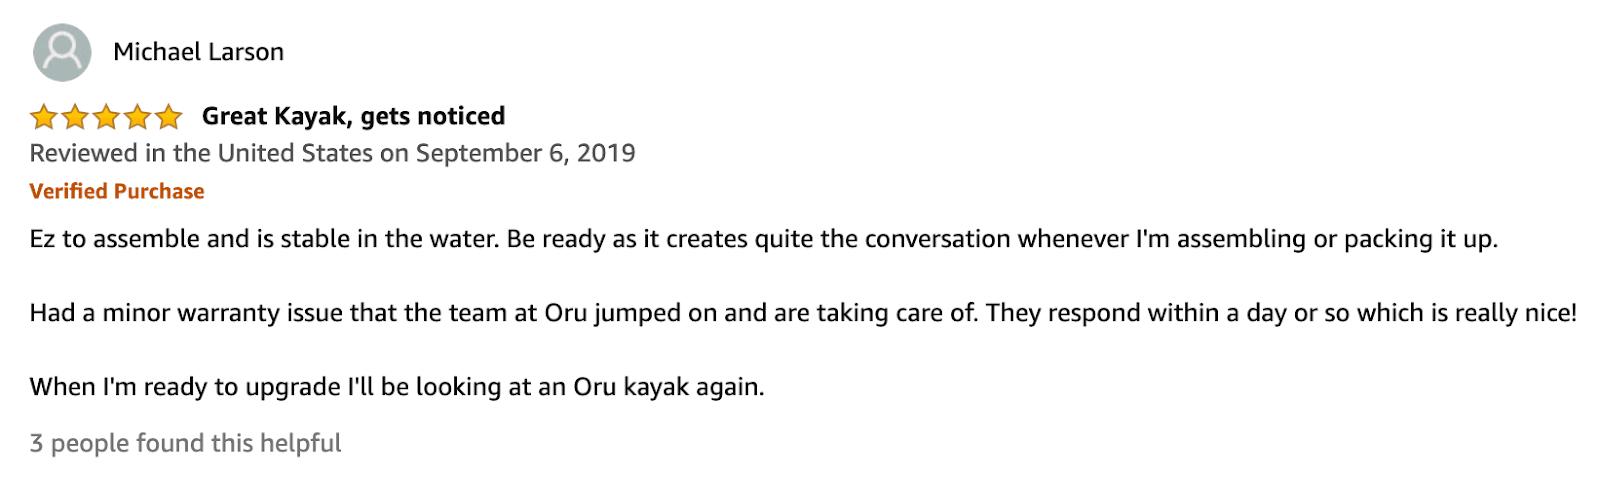 Oru Kayak reviews